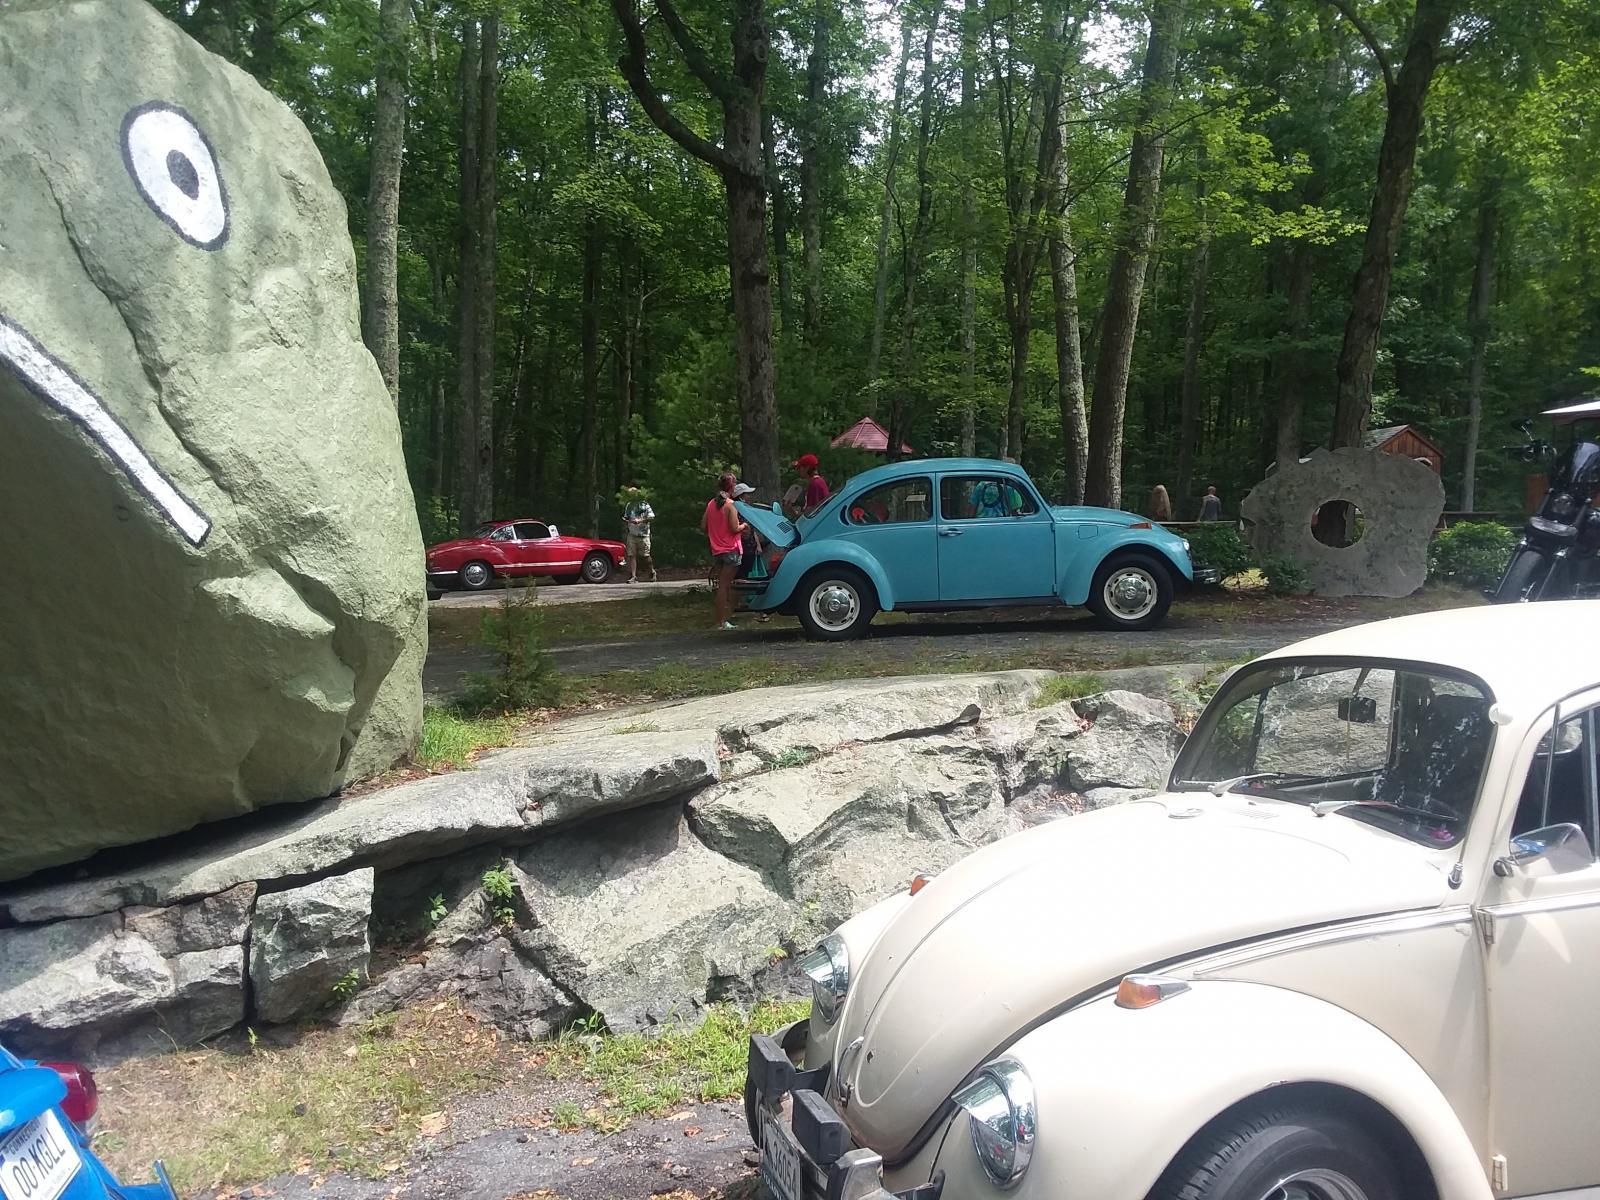 CVA 6th annual Frog Rock gathering